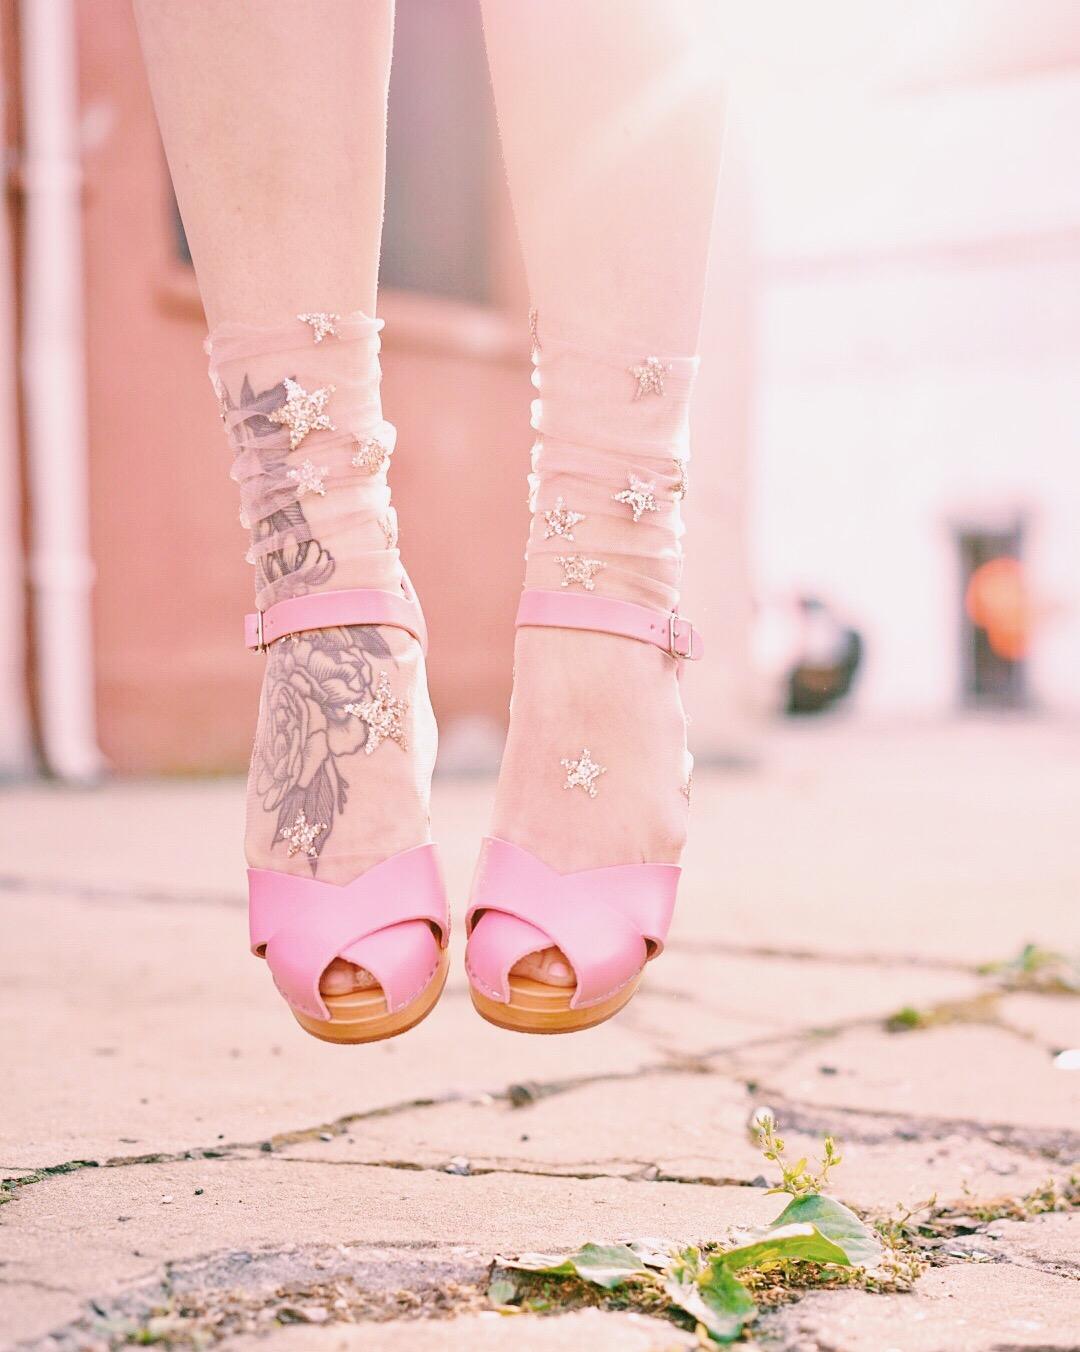 swedish hasbeens and lirika matoshi tulle star socks